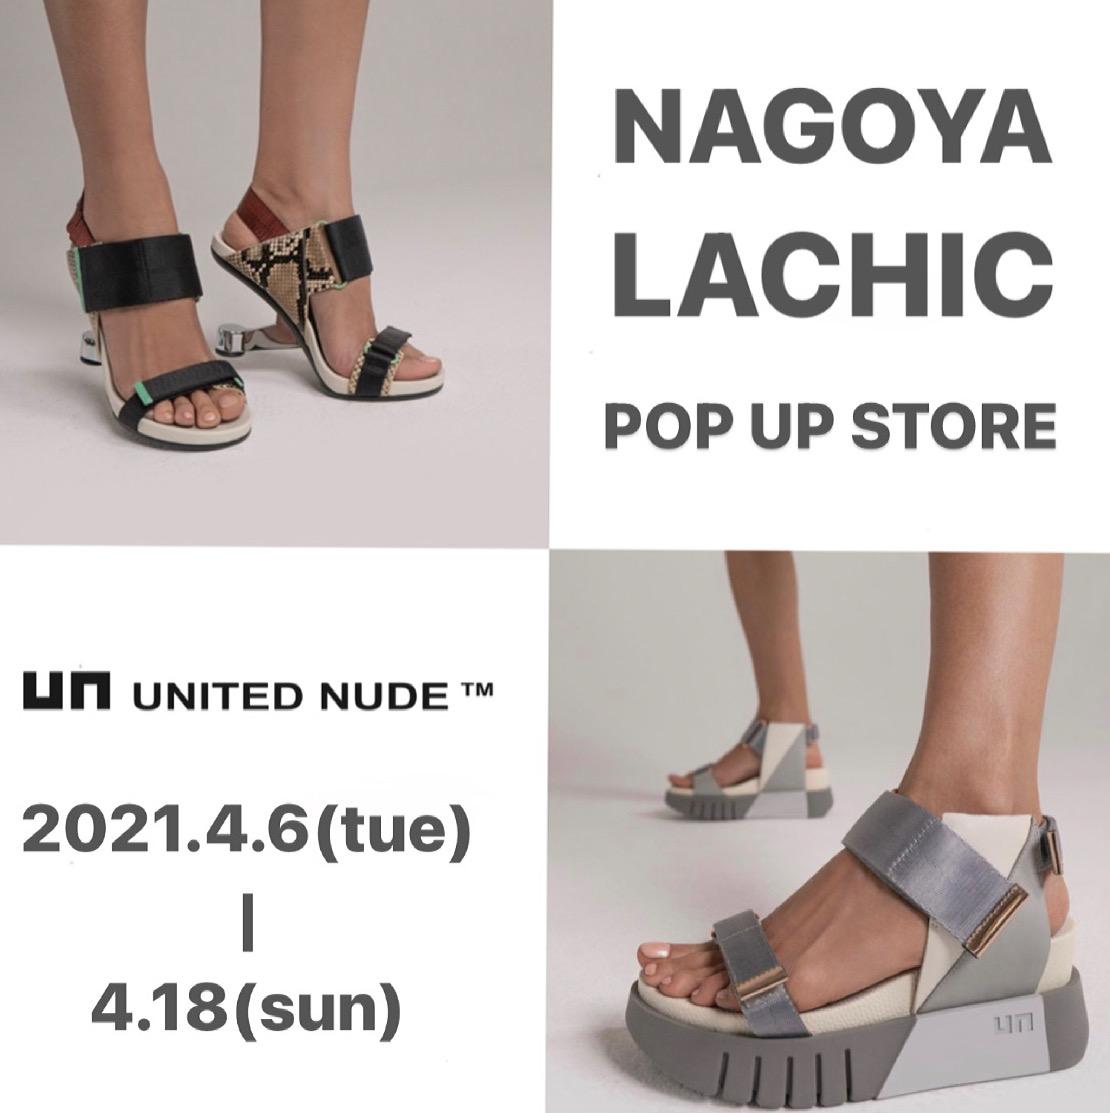 NAGOYA LACHIC/POP UP STORE